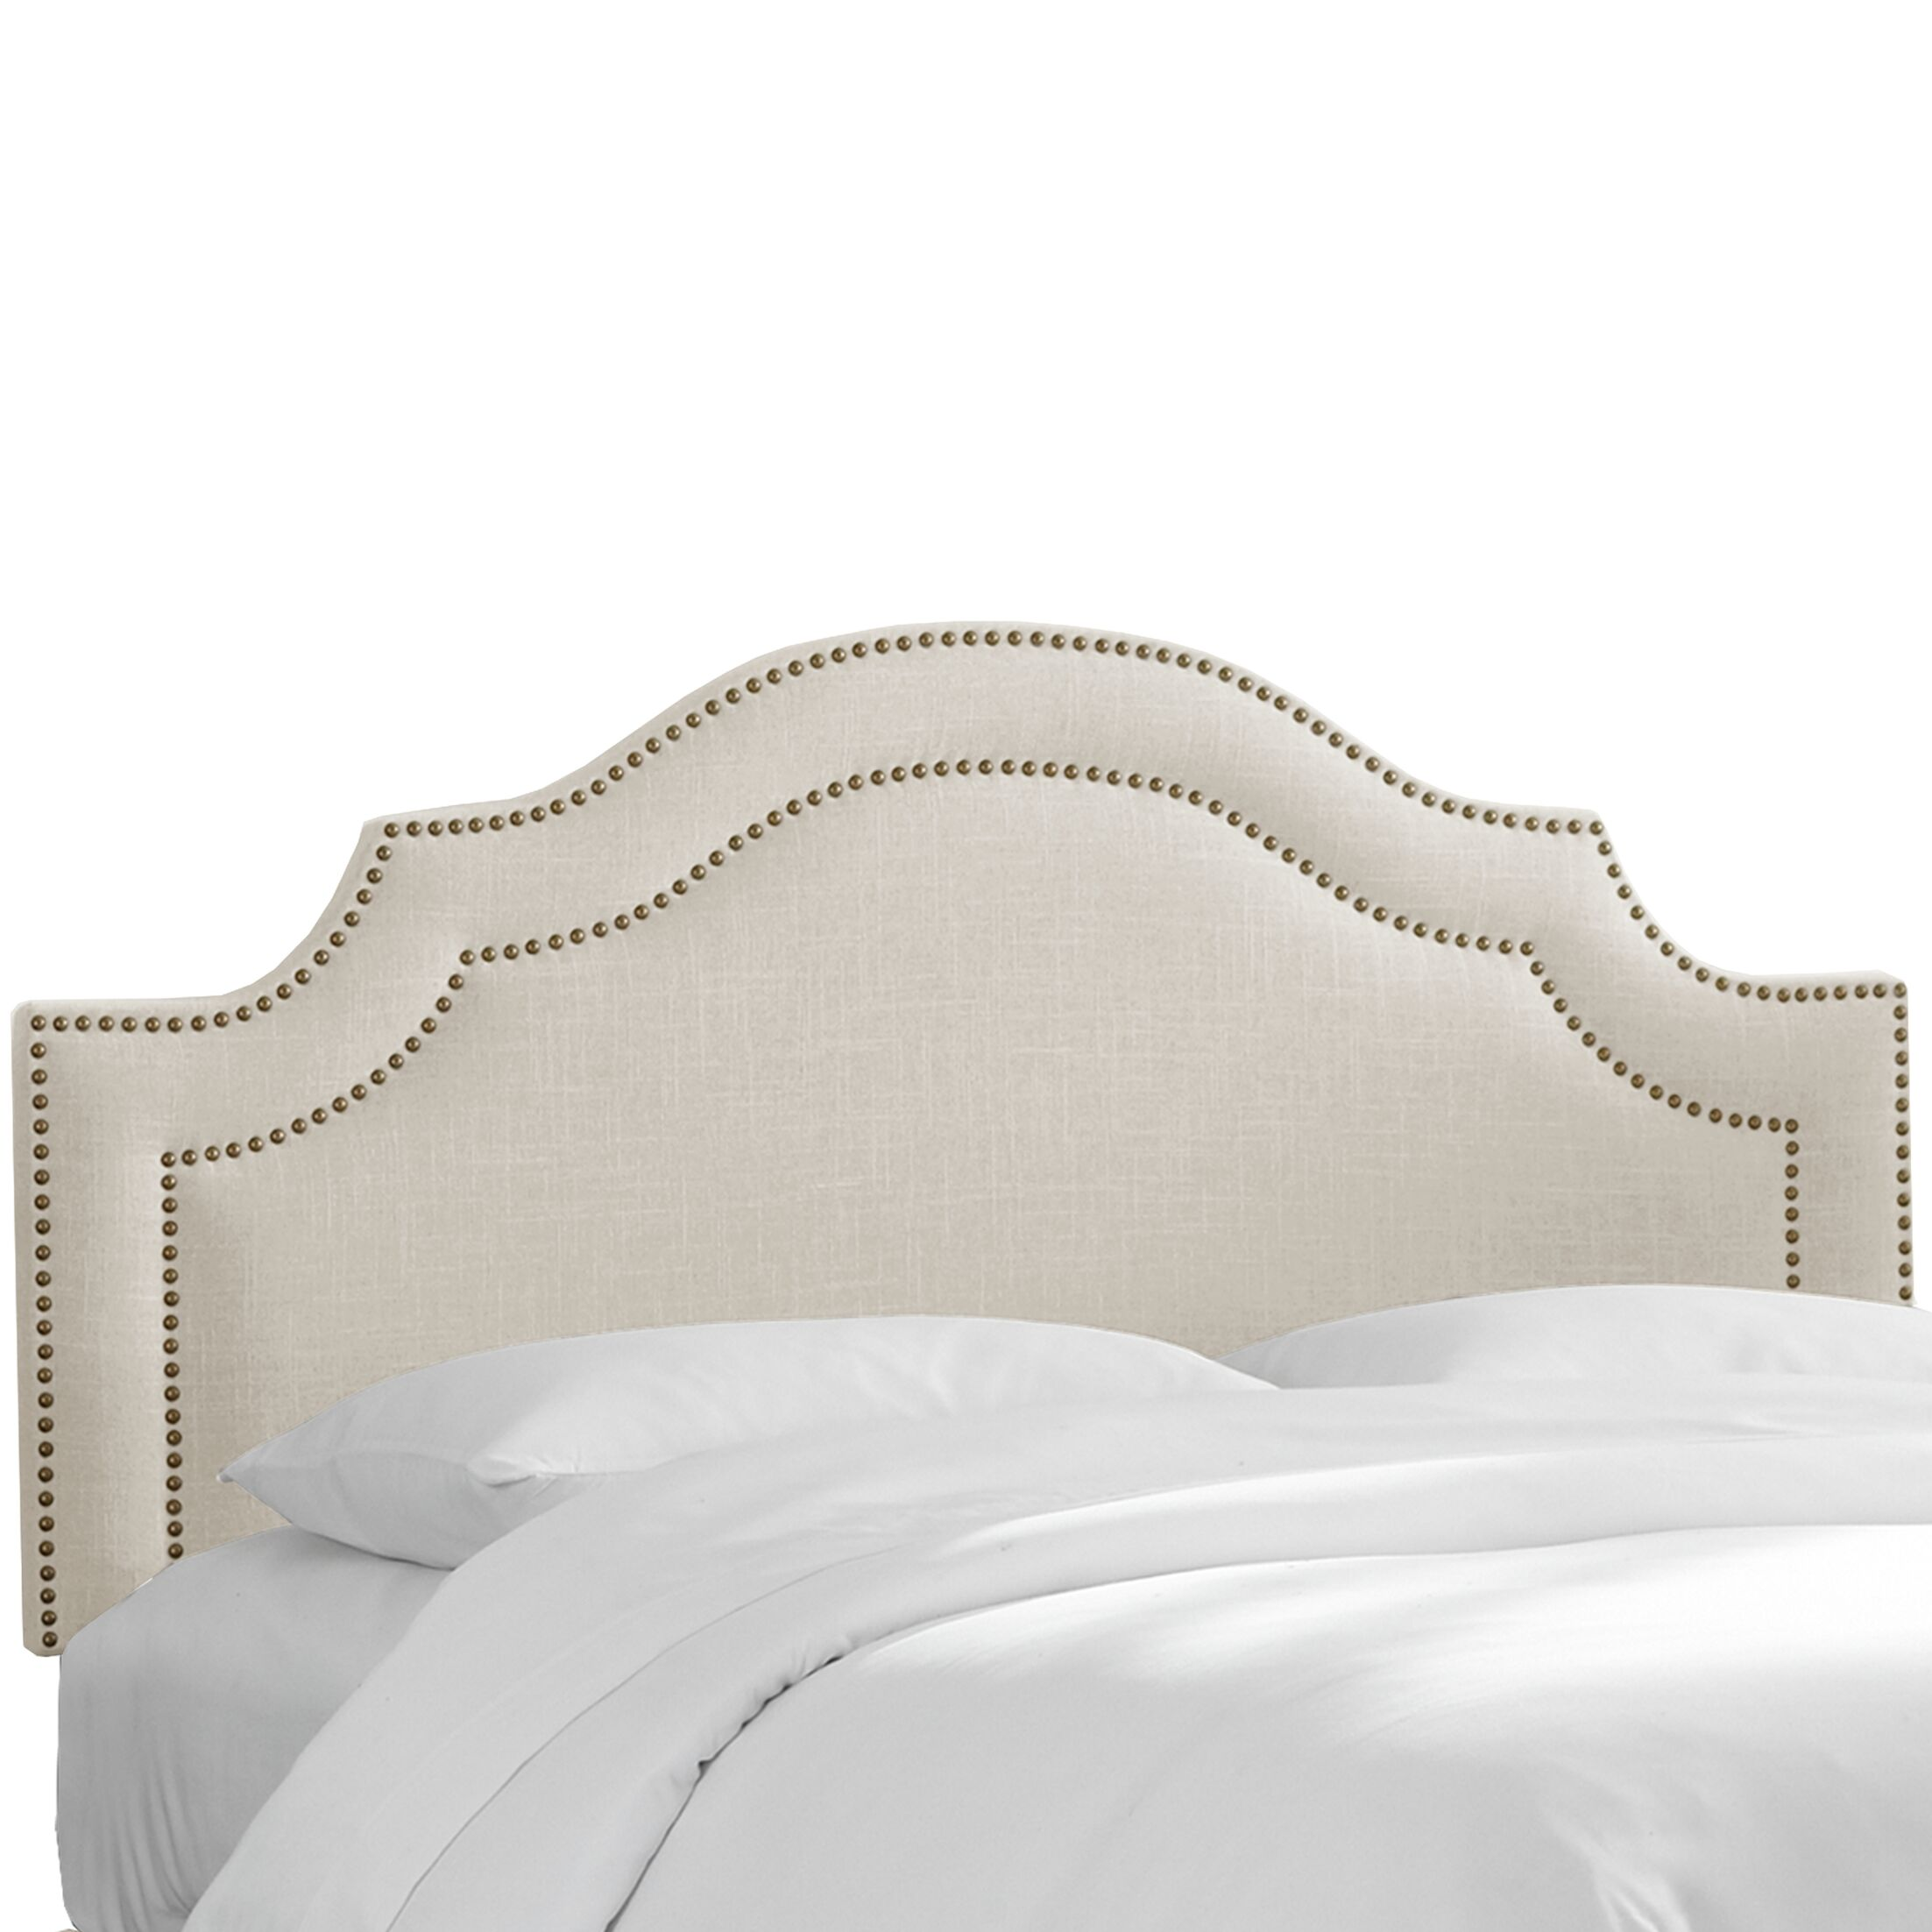 Fleischmann Arch Upholstered Panel Headboard Upholstery: Talc, Size: King